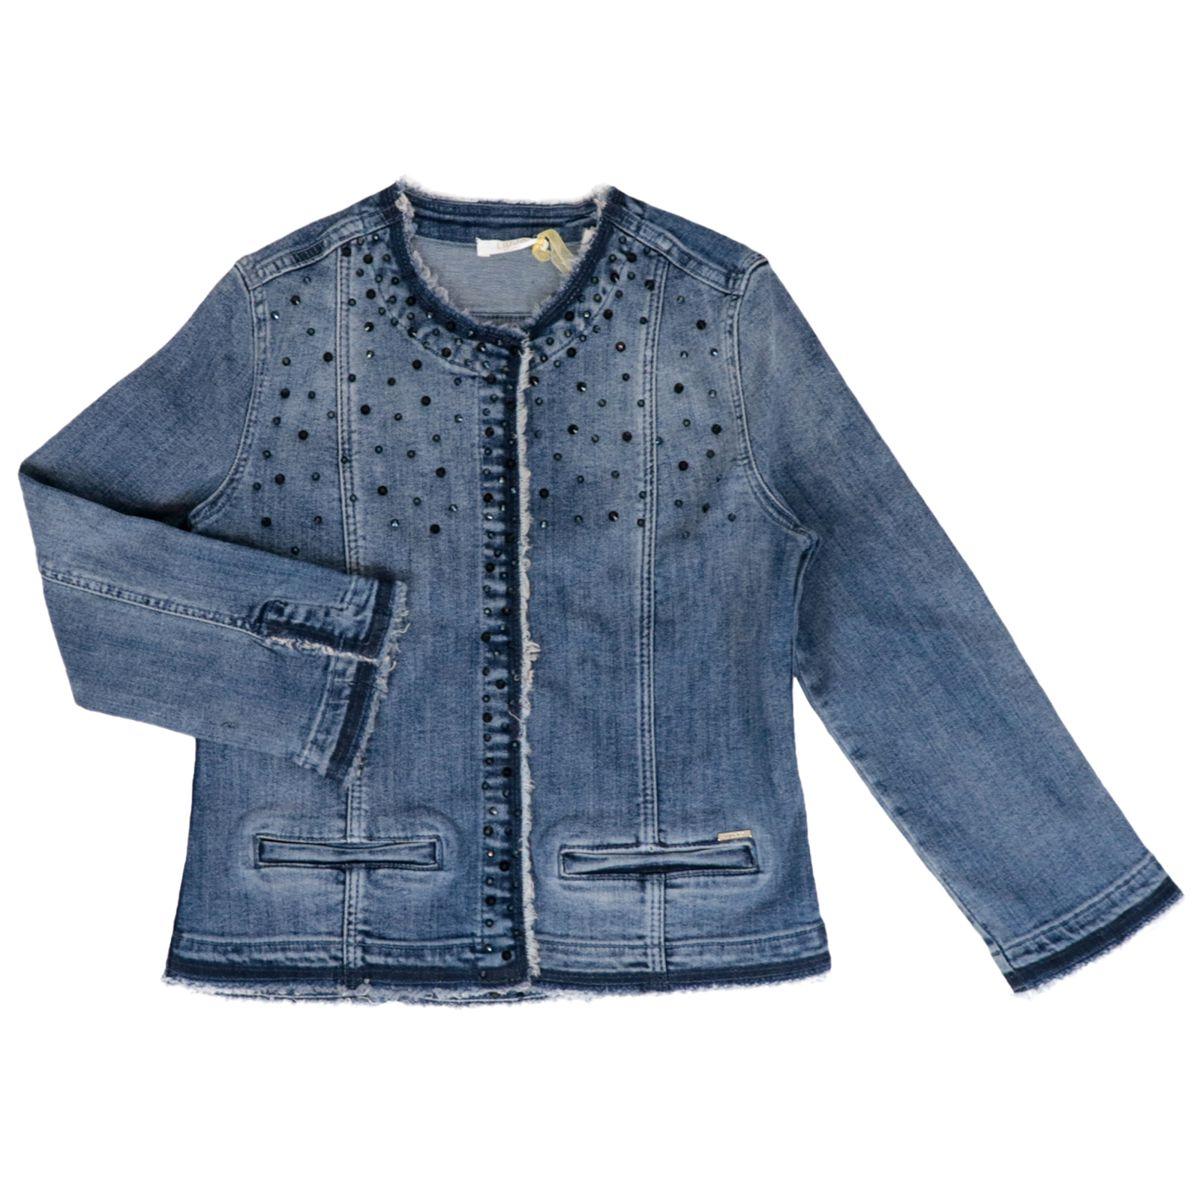 Denim jacket in strech denim with stonewash wash and rhinestones Blue denim Liu Jo